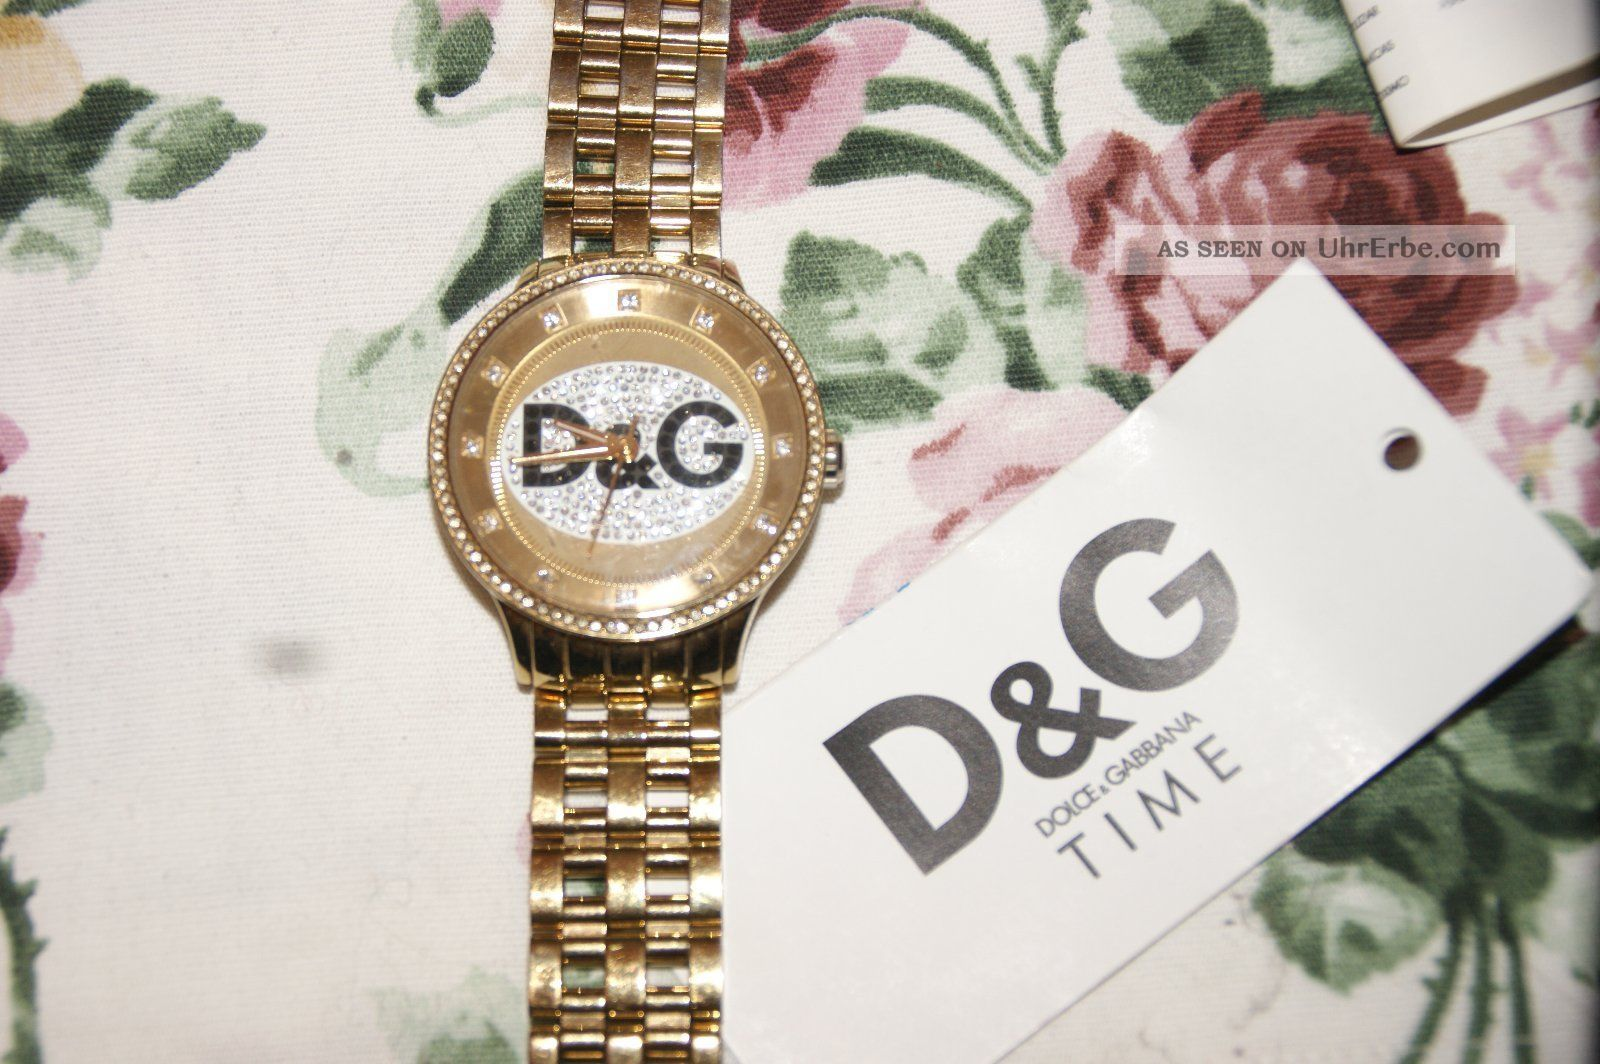 Dolce Gabbana Time Uhr Gold Unisex Blogger Armbanduhren Bild